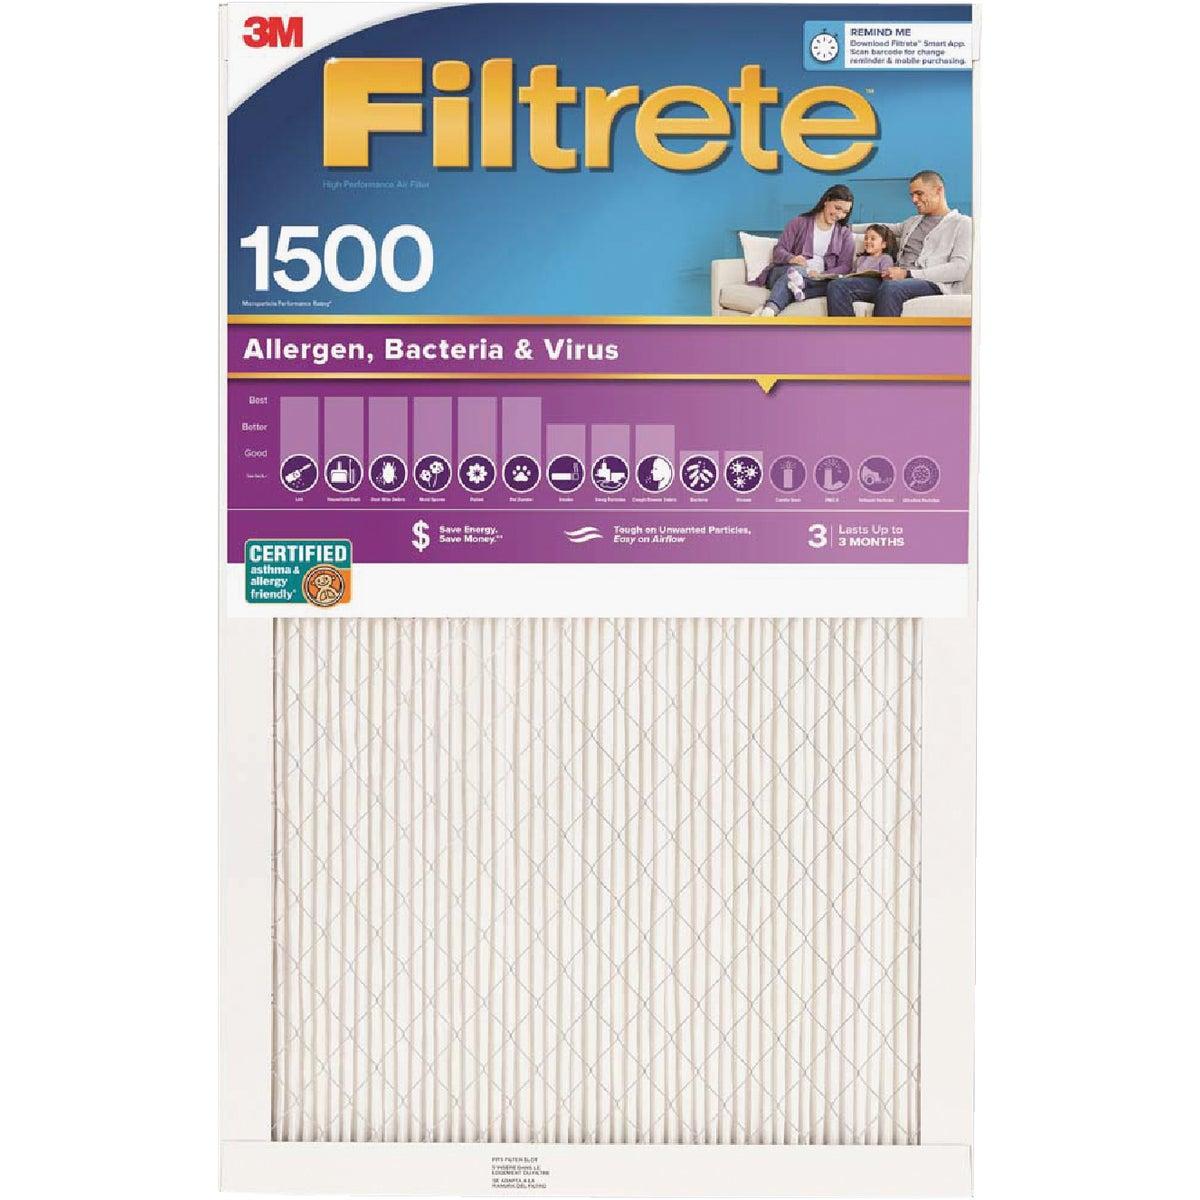 3M Filtrete 20 In. x 25 In. x 1 In. Ultra Allergen Healthy Living 1550 MPR Furnace Filter